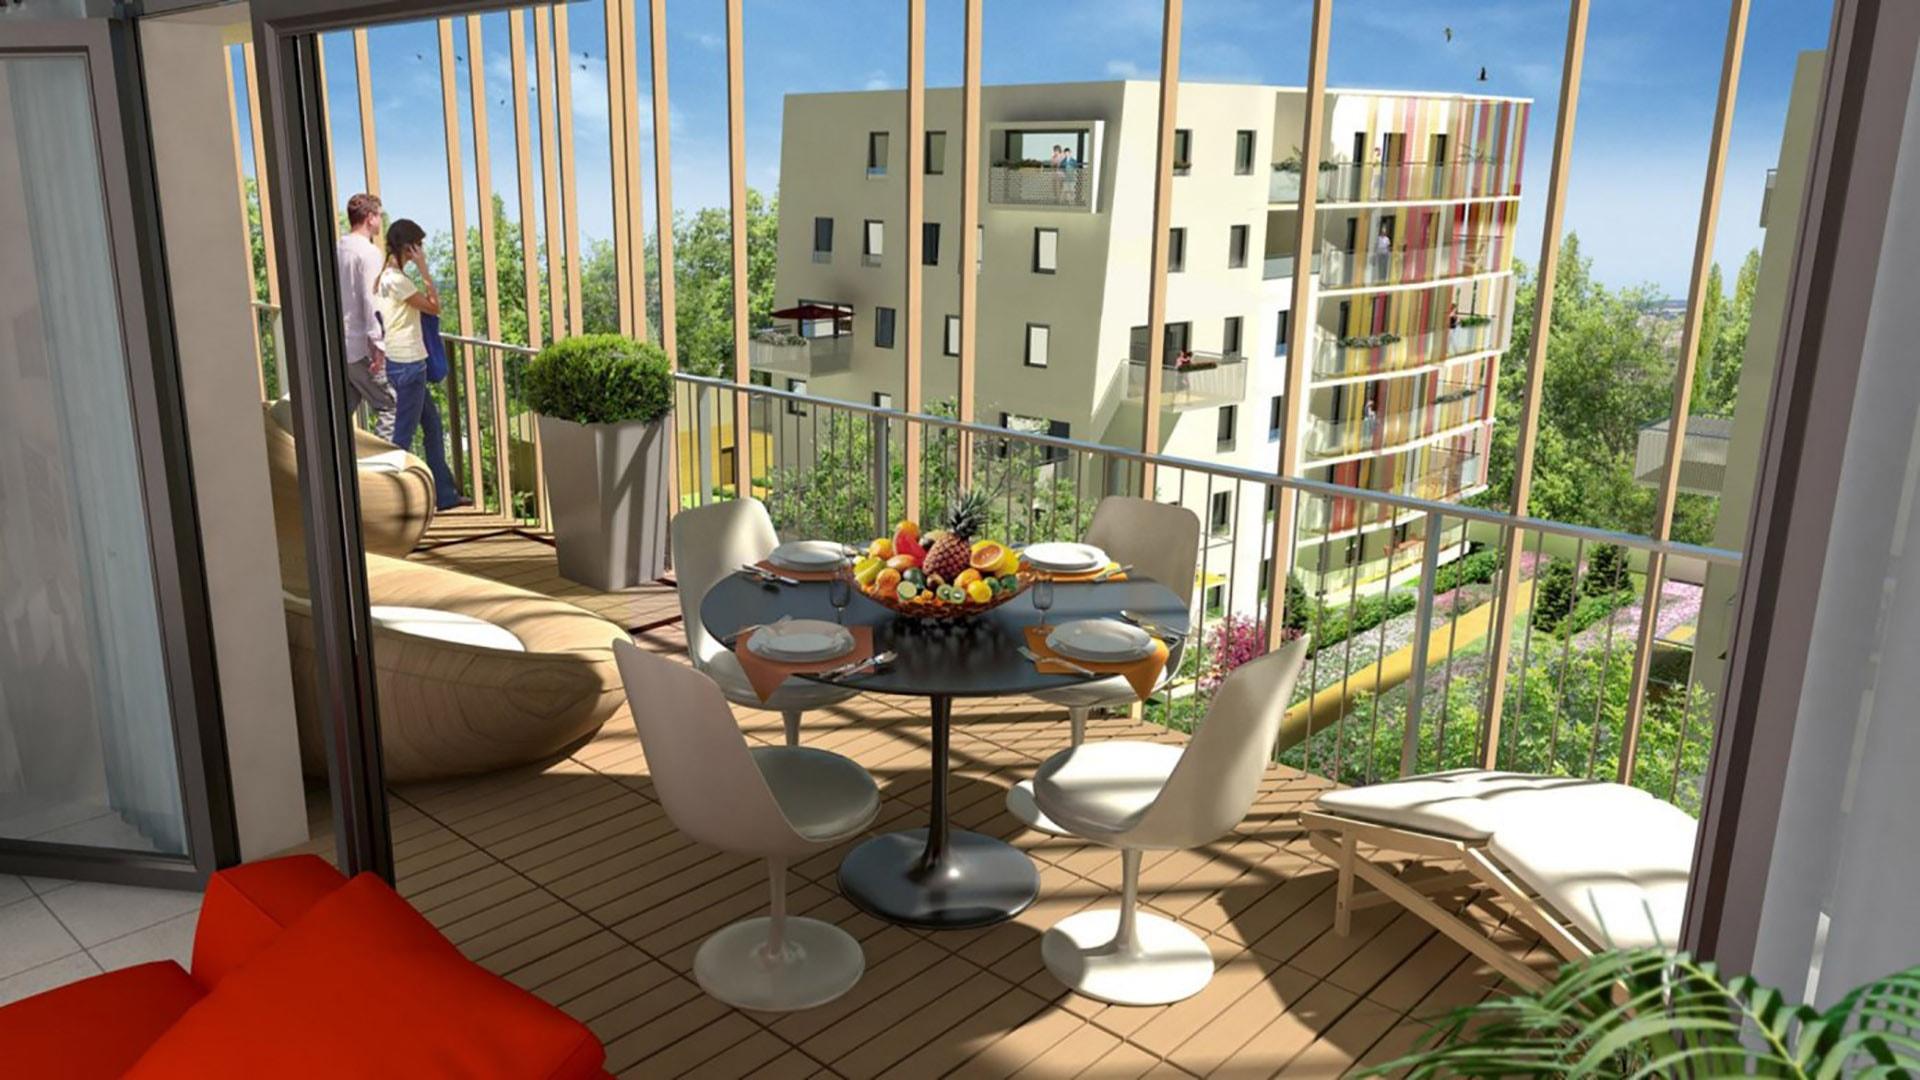 L le ´ Jardins programme immobilier neuf  Toulouse